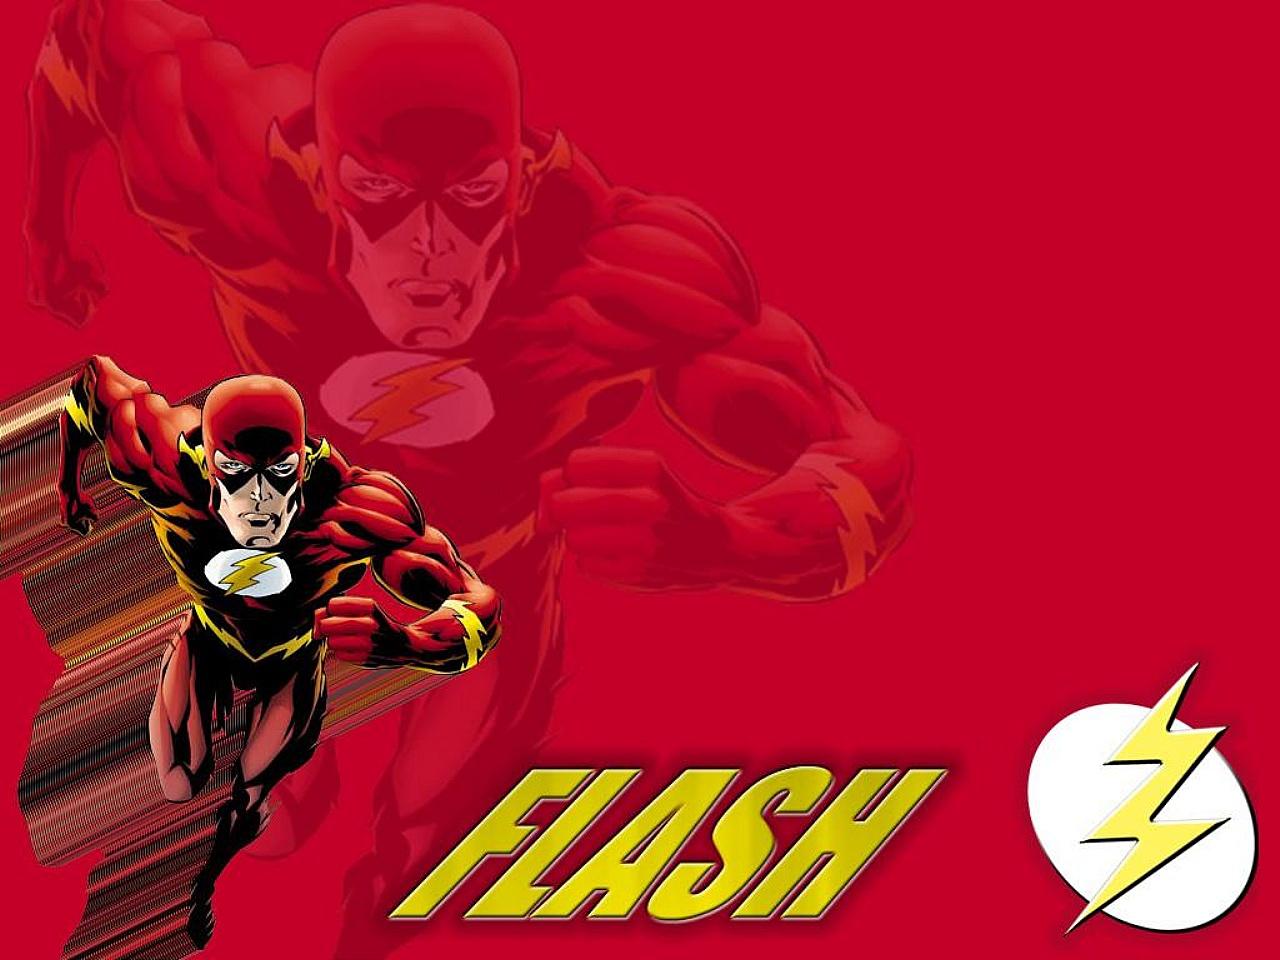 The Flash 3   Comics Photography Desktop Wallpapers 6968 Views 1280x960